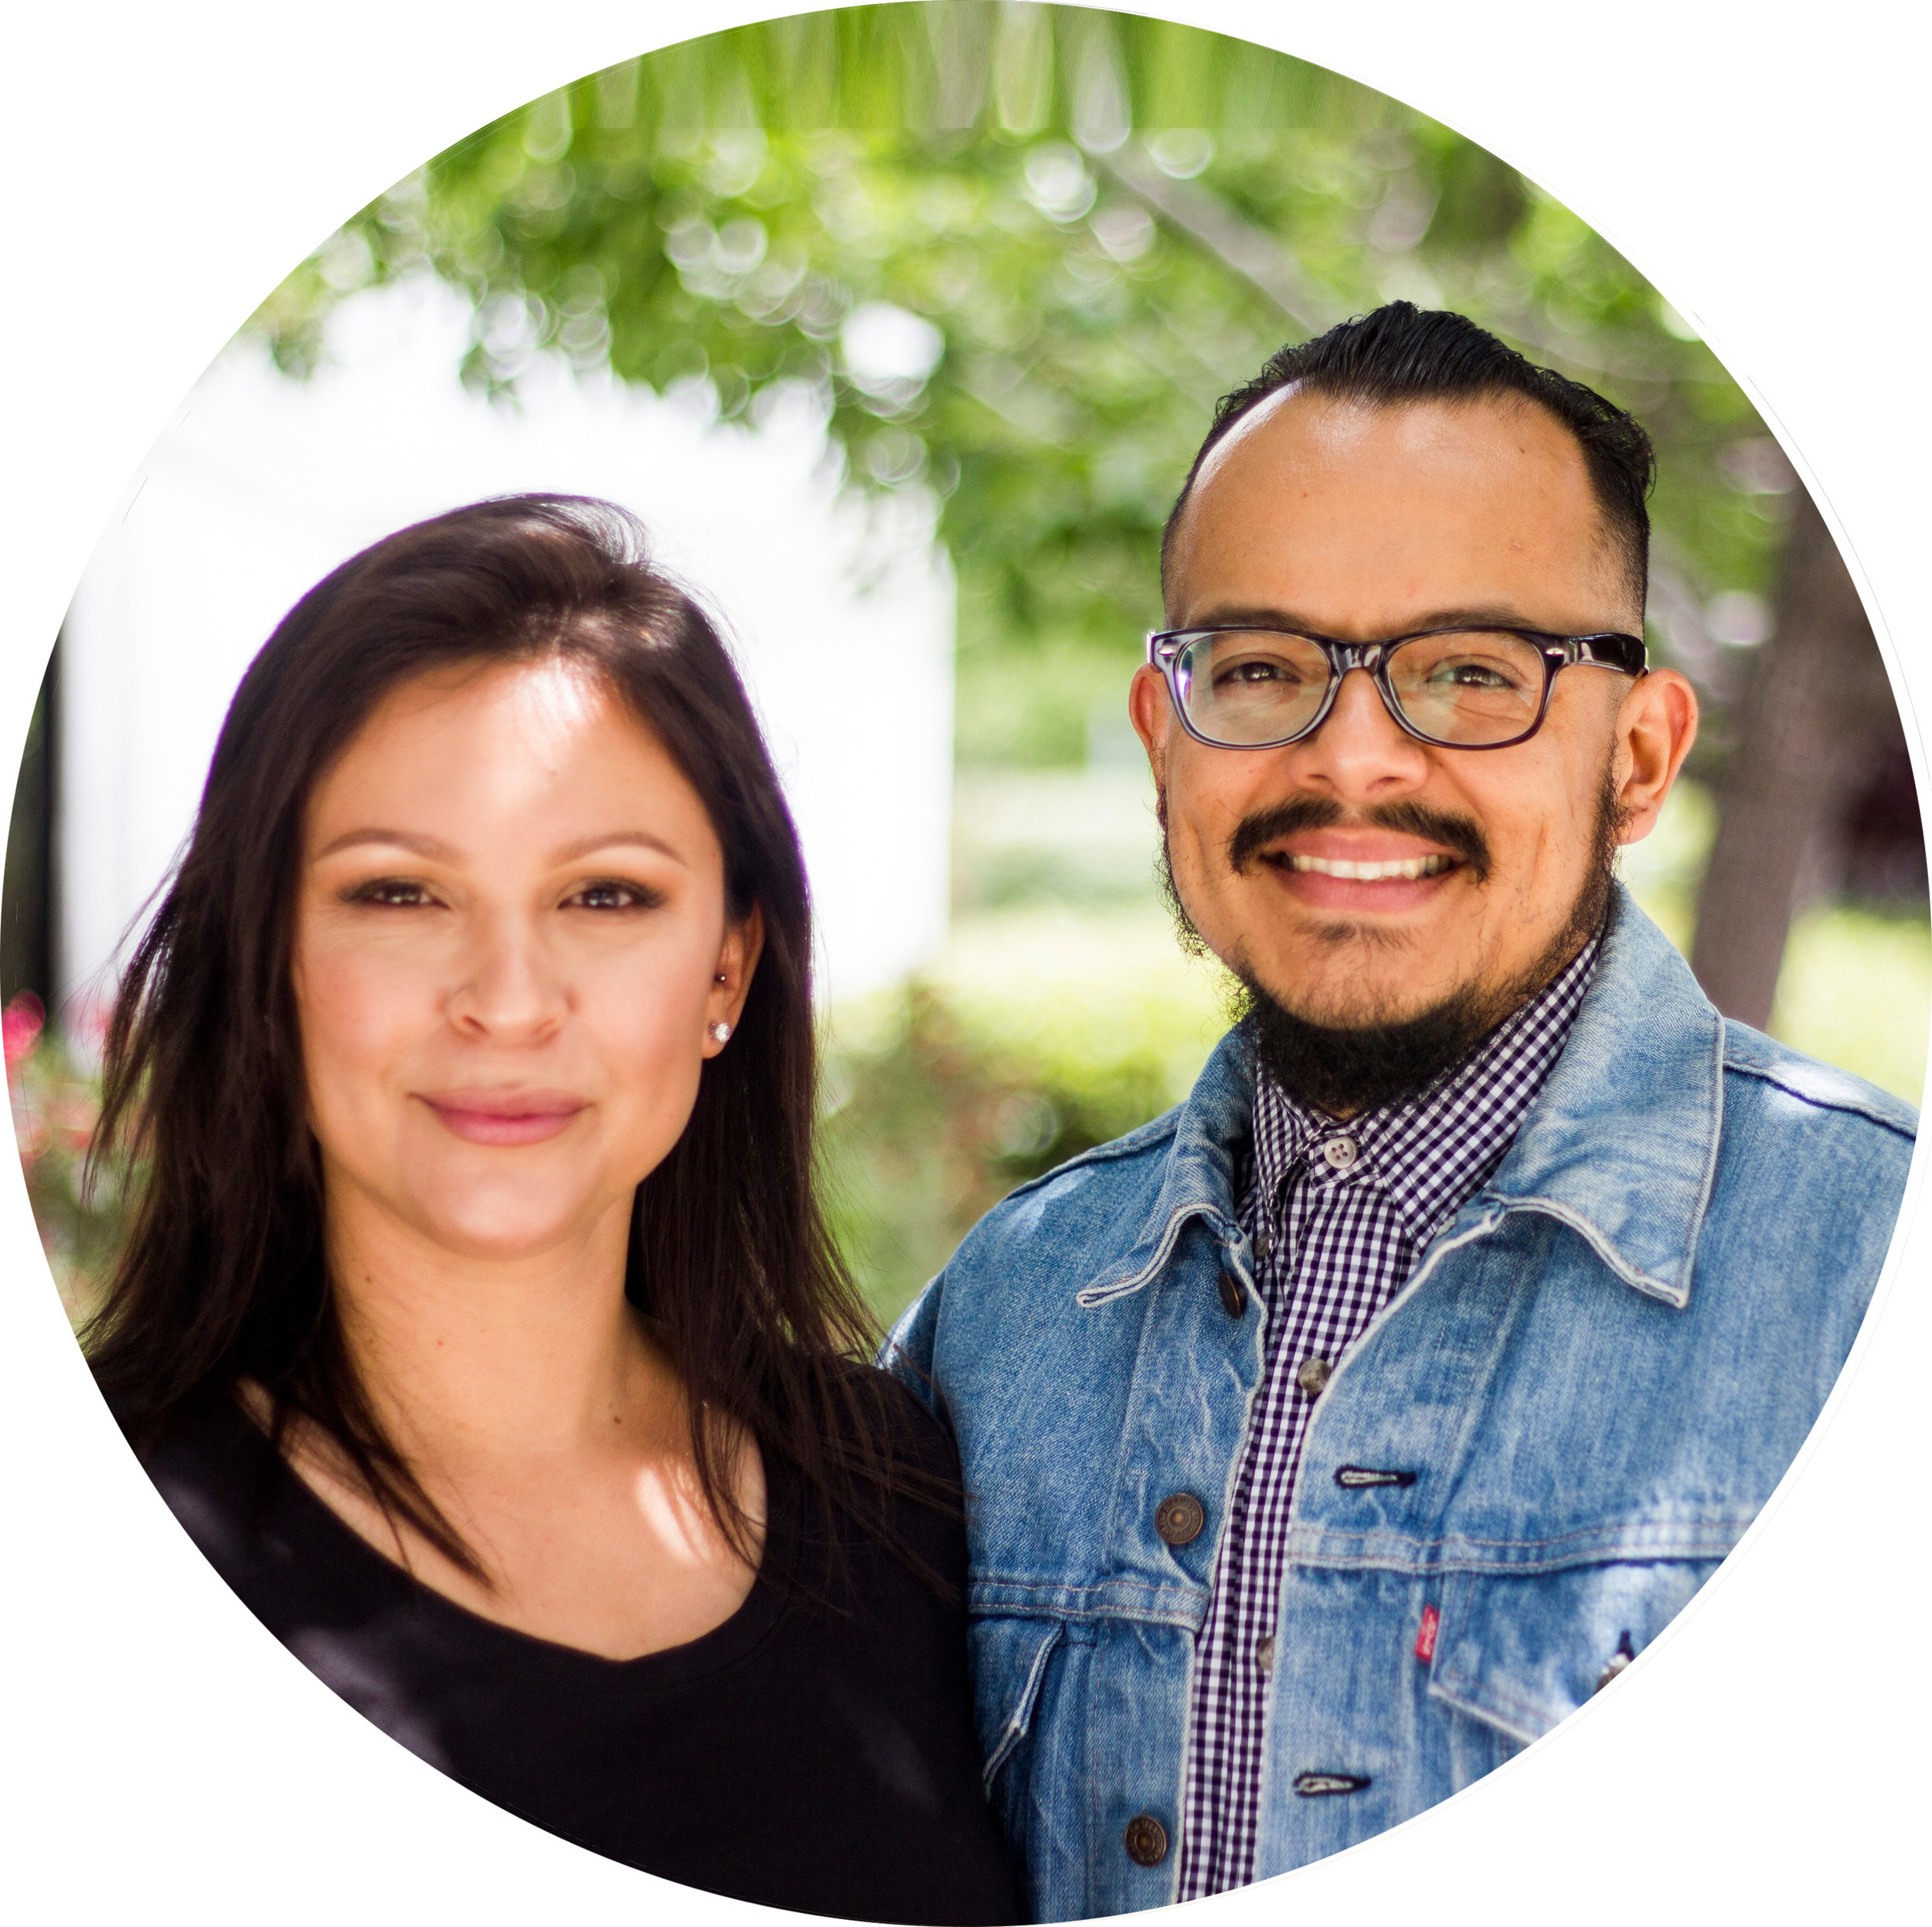 JENNA & NICK RODRIGUEZ   The Platform Leaders